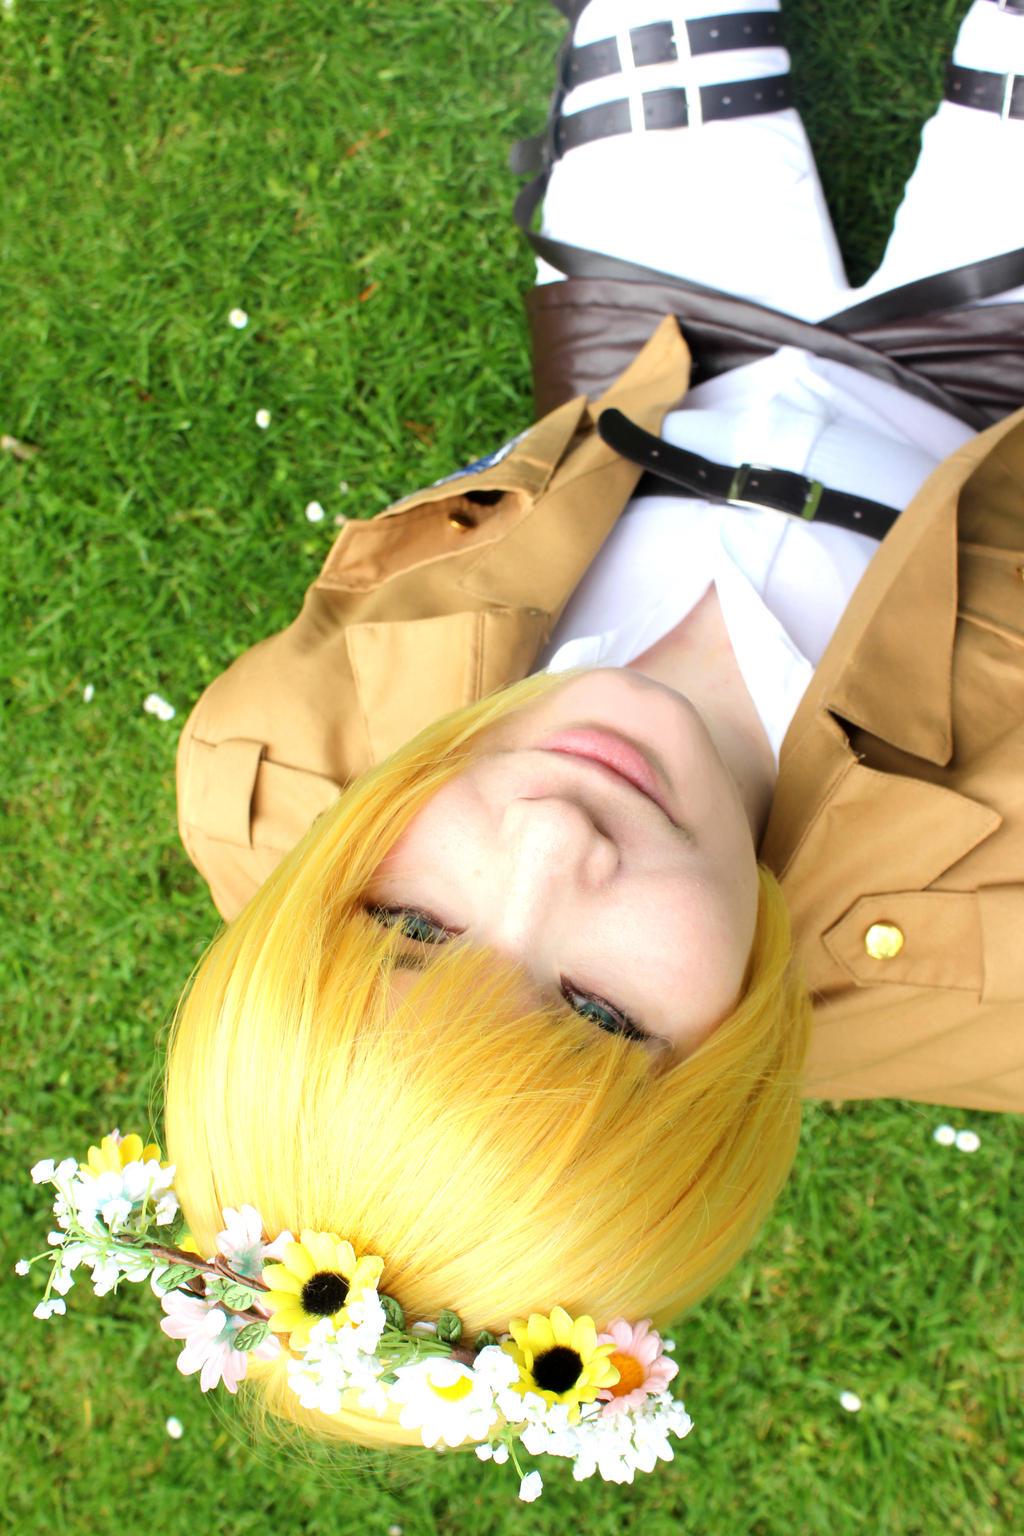 Armin Arlert by Chee-Cos